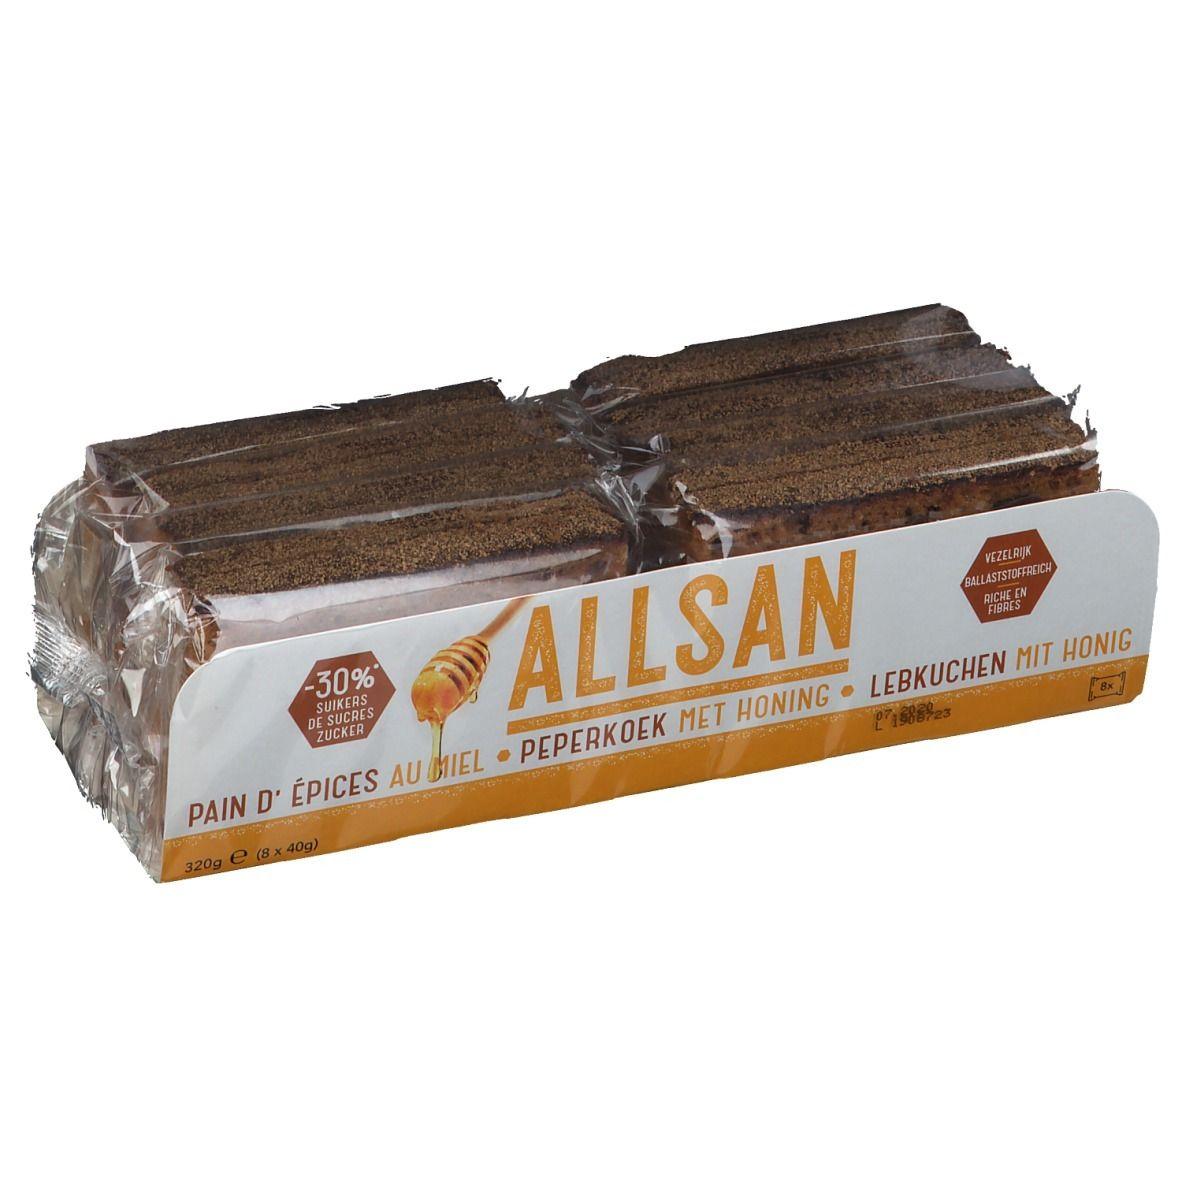 Image of Allsan Lebkuchen mit Honig